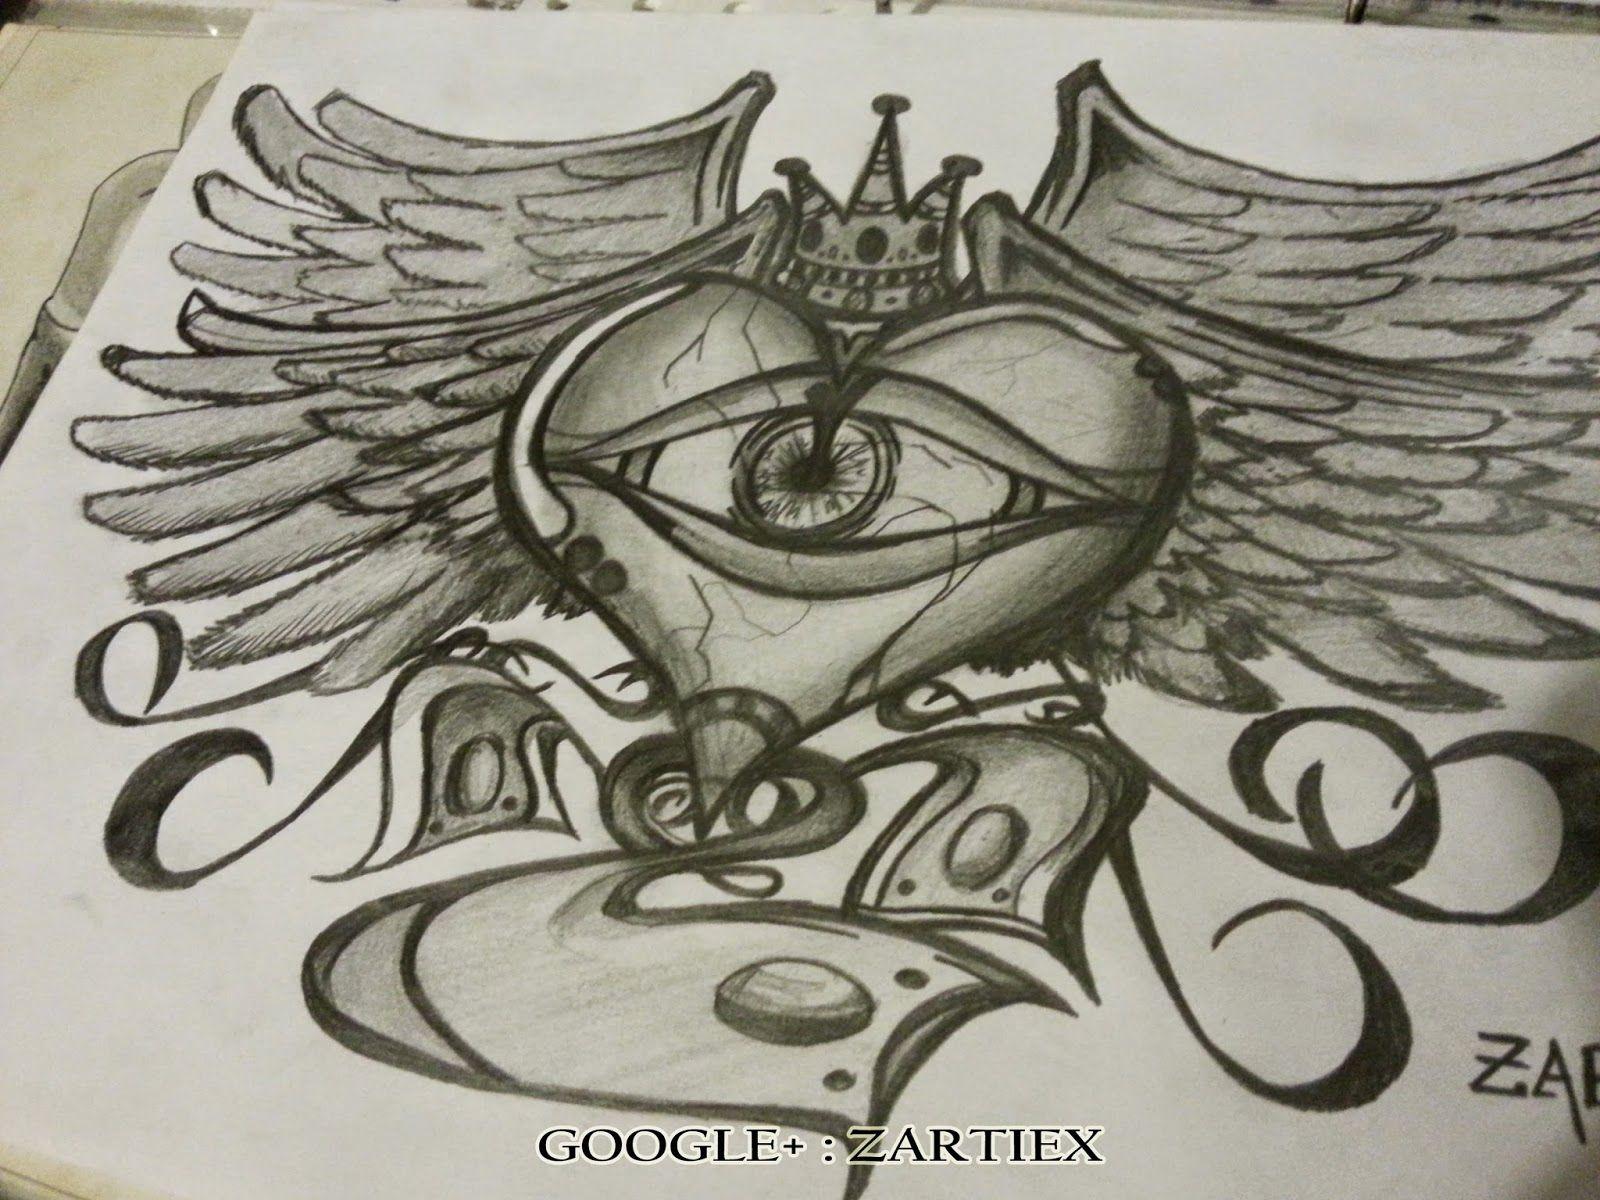 Tatuajes de corazones  Dibujos de corazones  Dibujos corazon